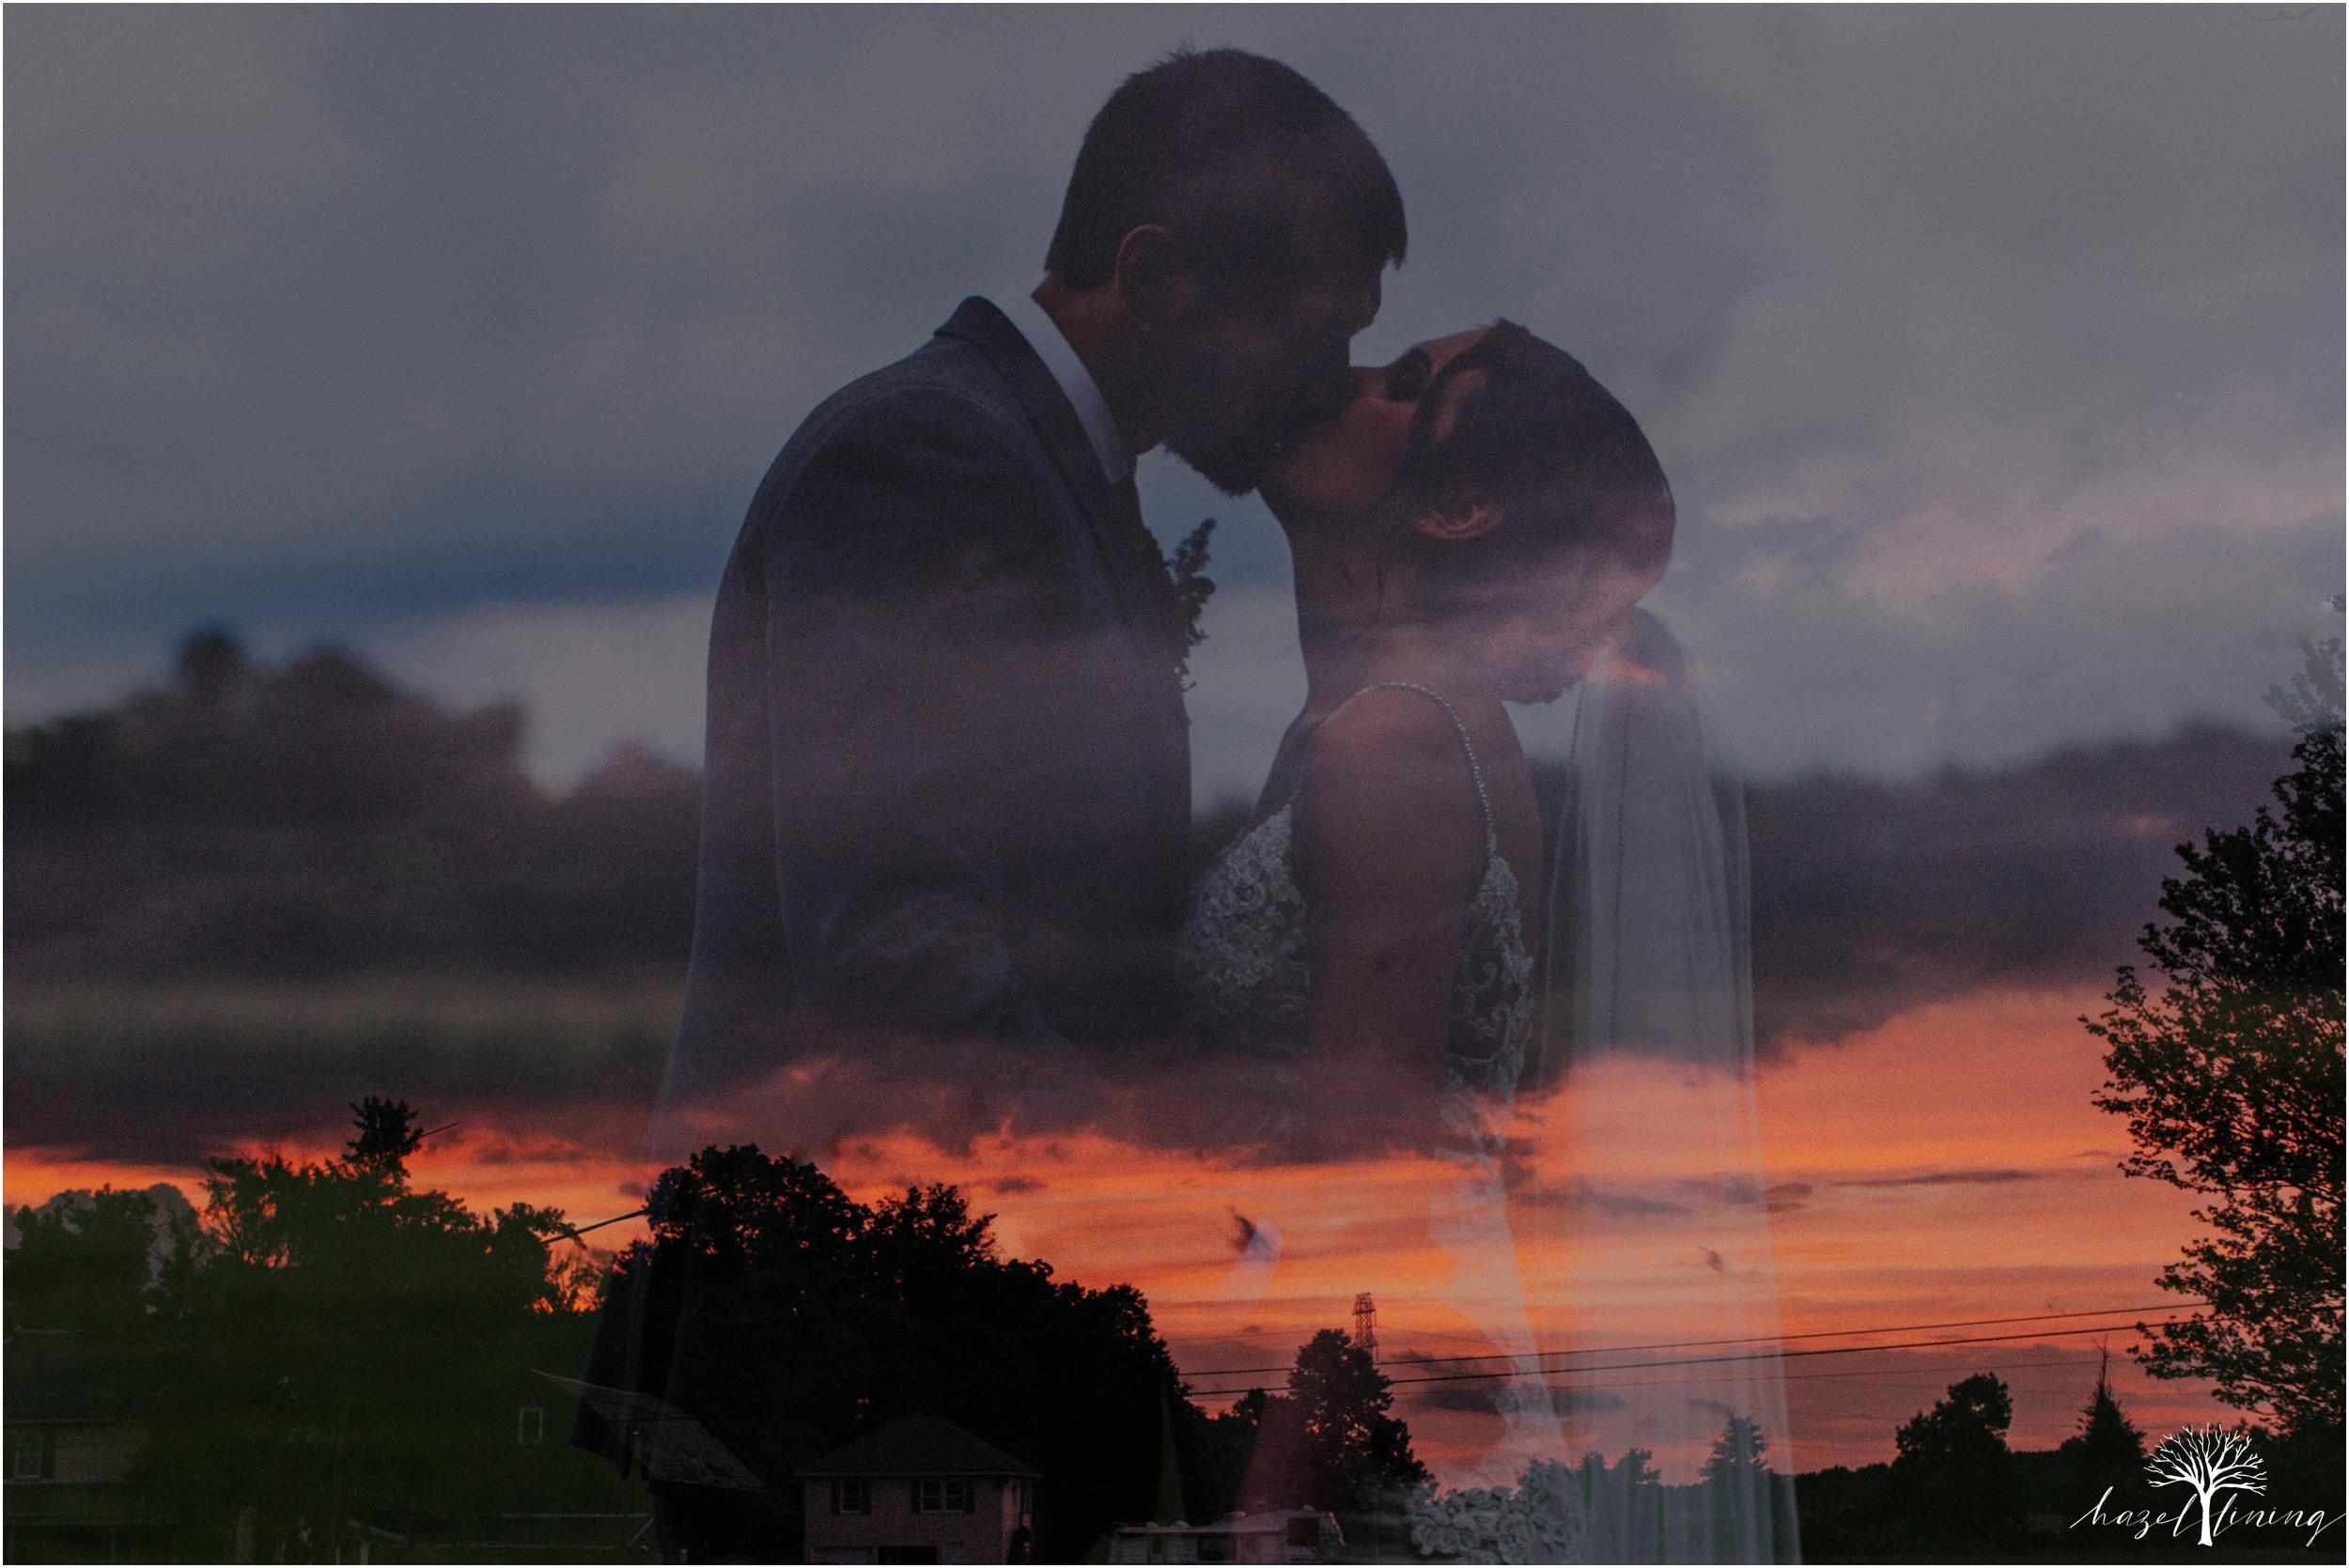 hazel-lining-travel-wedding-elopement-photography-lisa-landon-shoemaker-the-farm-bakery-and-events-bucks-county-quakertown-pennsylvania-summer-country-outdoor-farm-wedding_0175.jpg